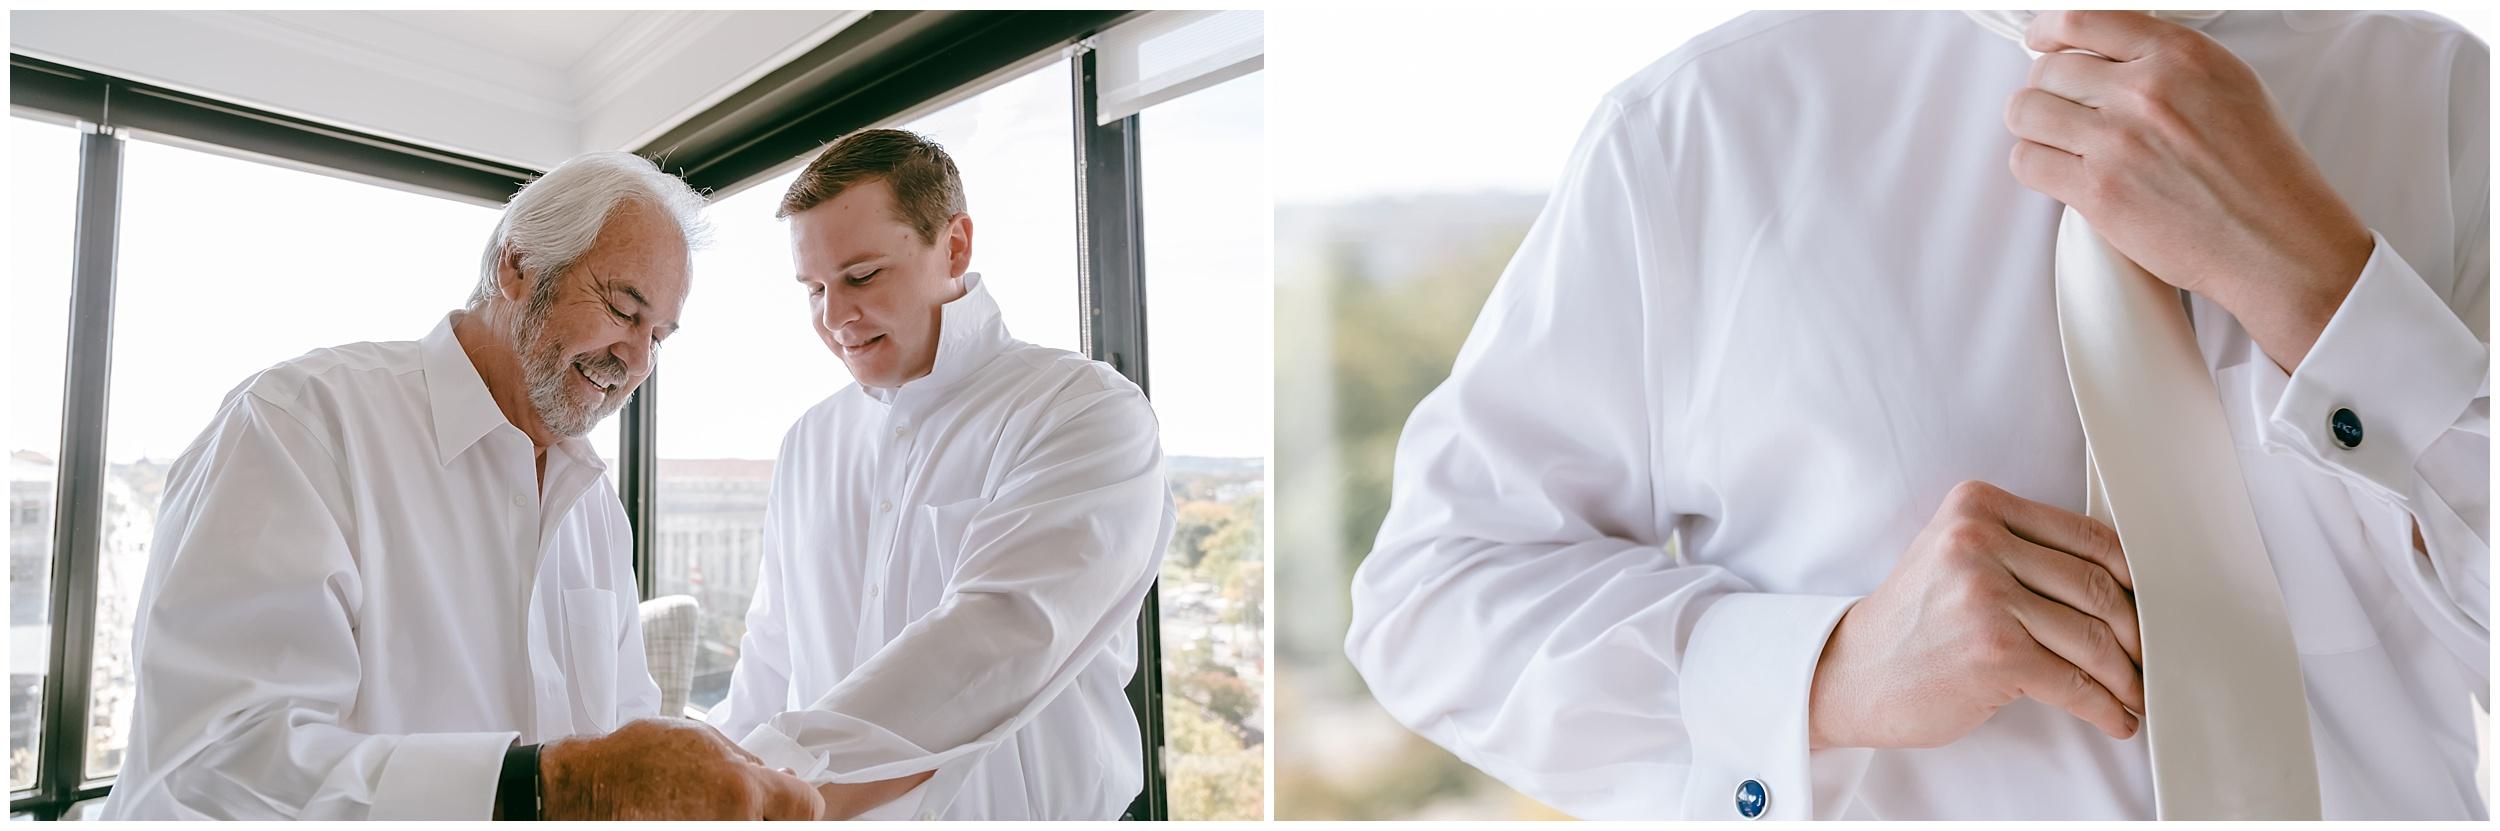 wedding-groom-father-getting-dressed-washington-dc-photographer